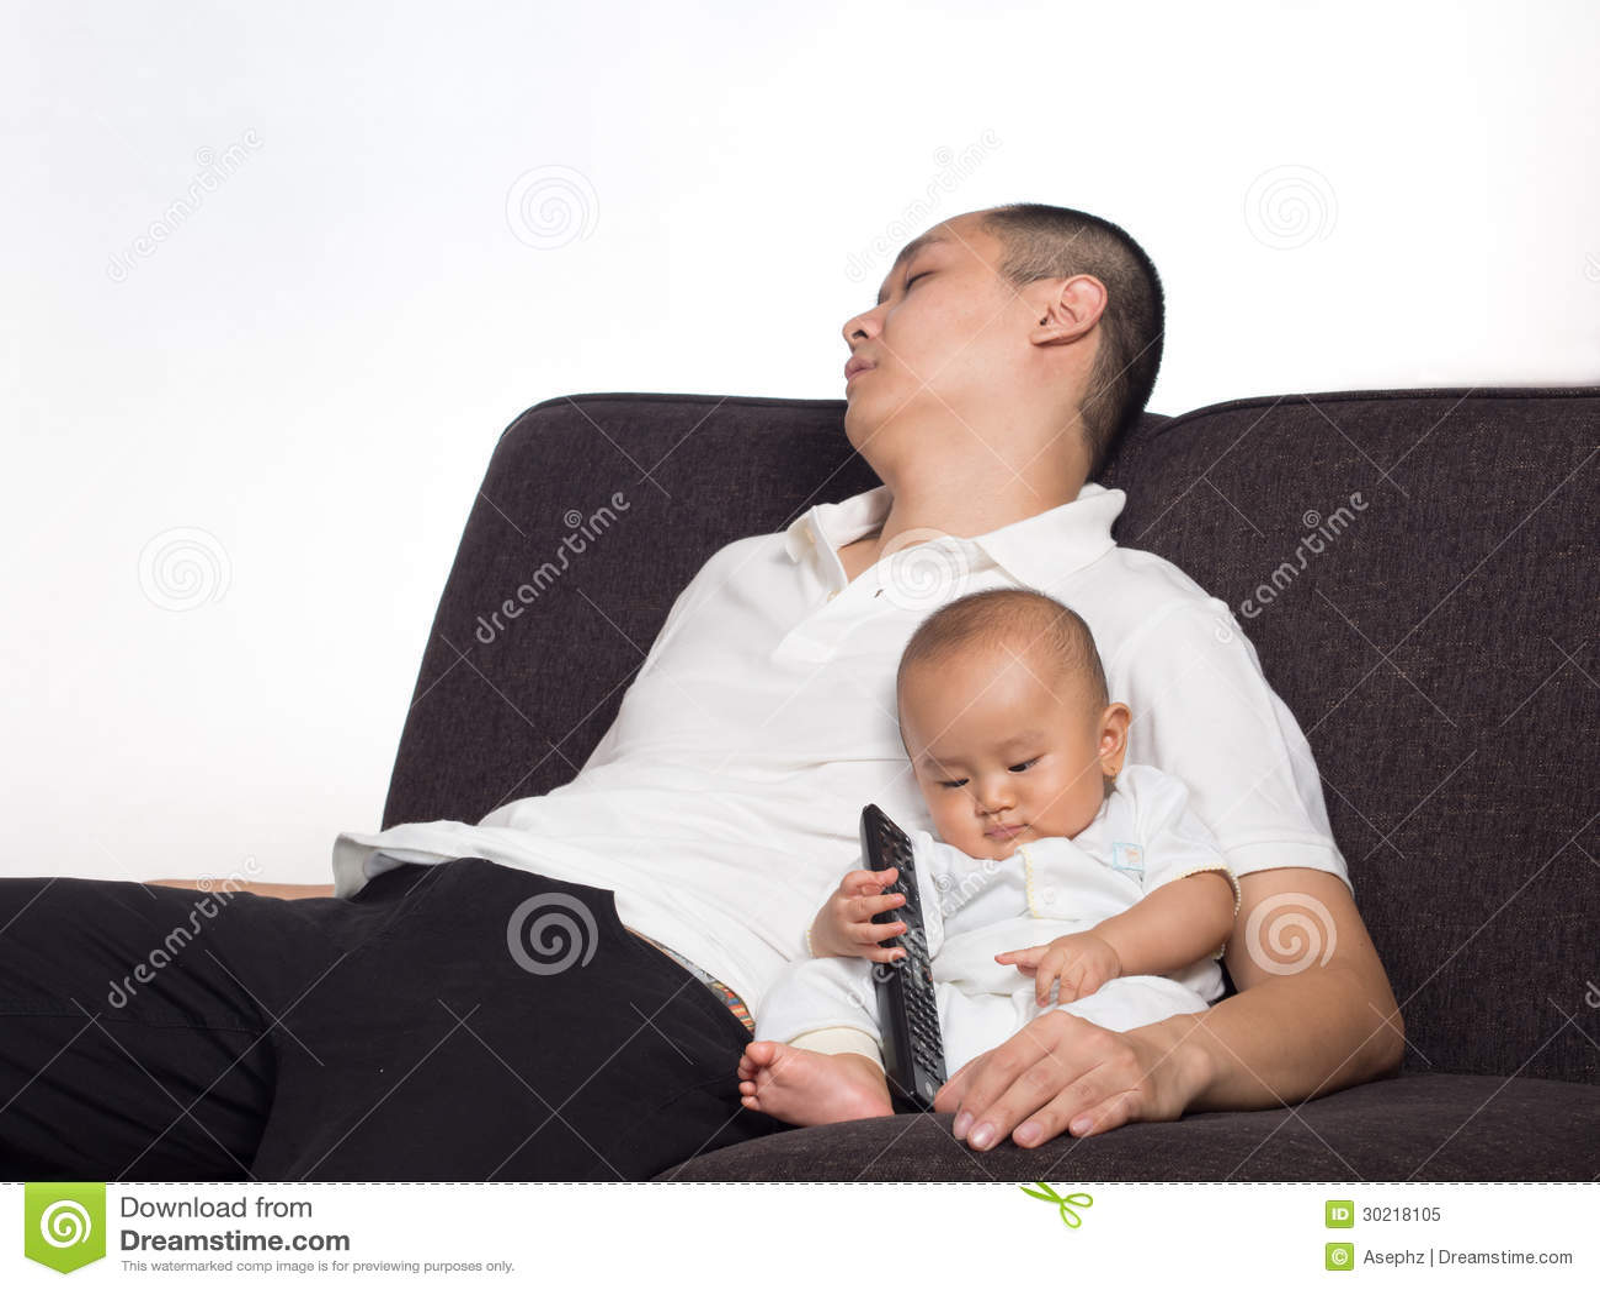 Sleeping Dad While Taking Care Of Baby Stock Image - Image ...